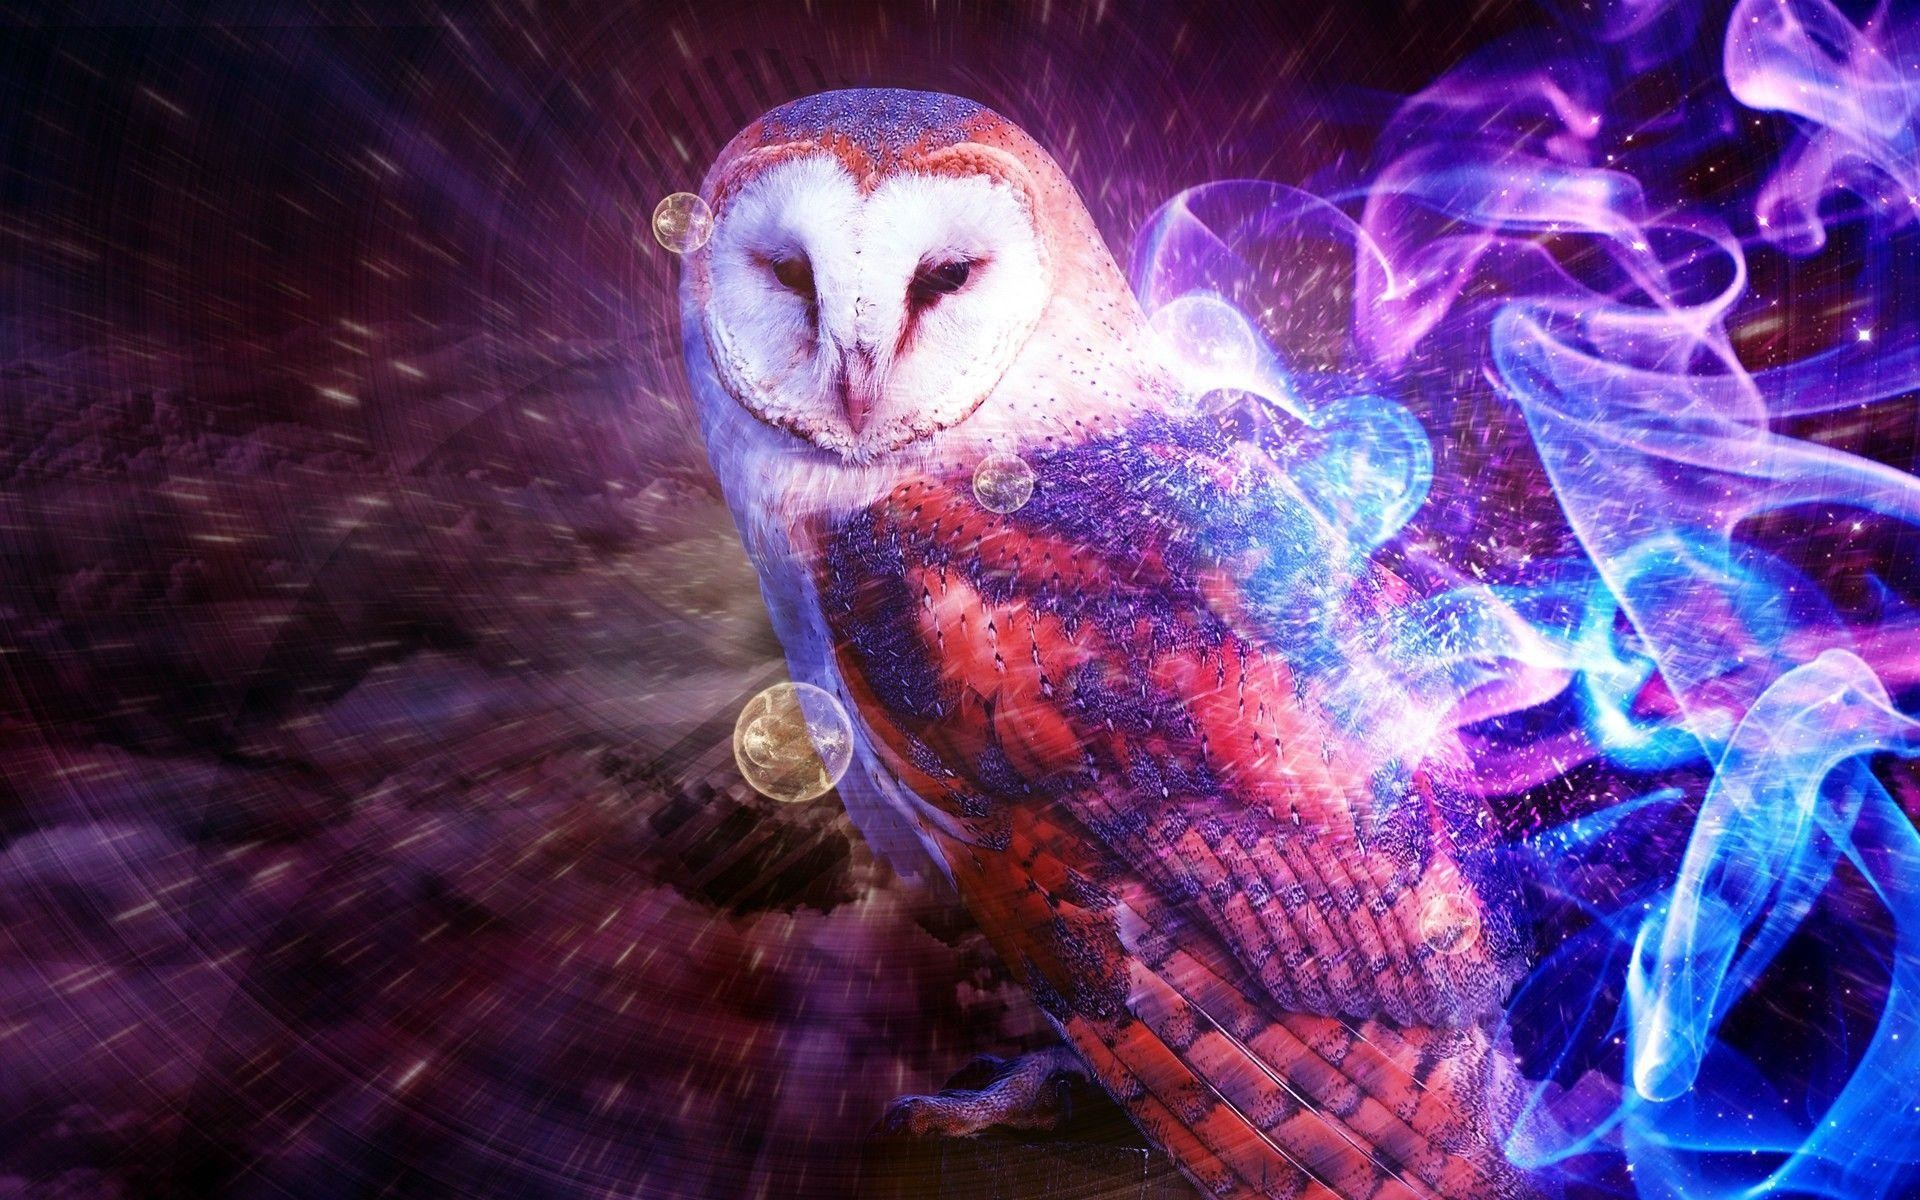 Cartoon Owl Wallpaper – WallpaperSafari